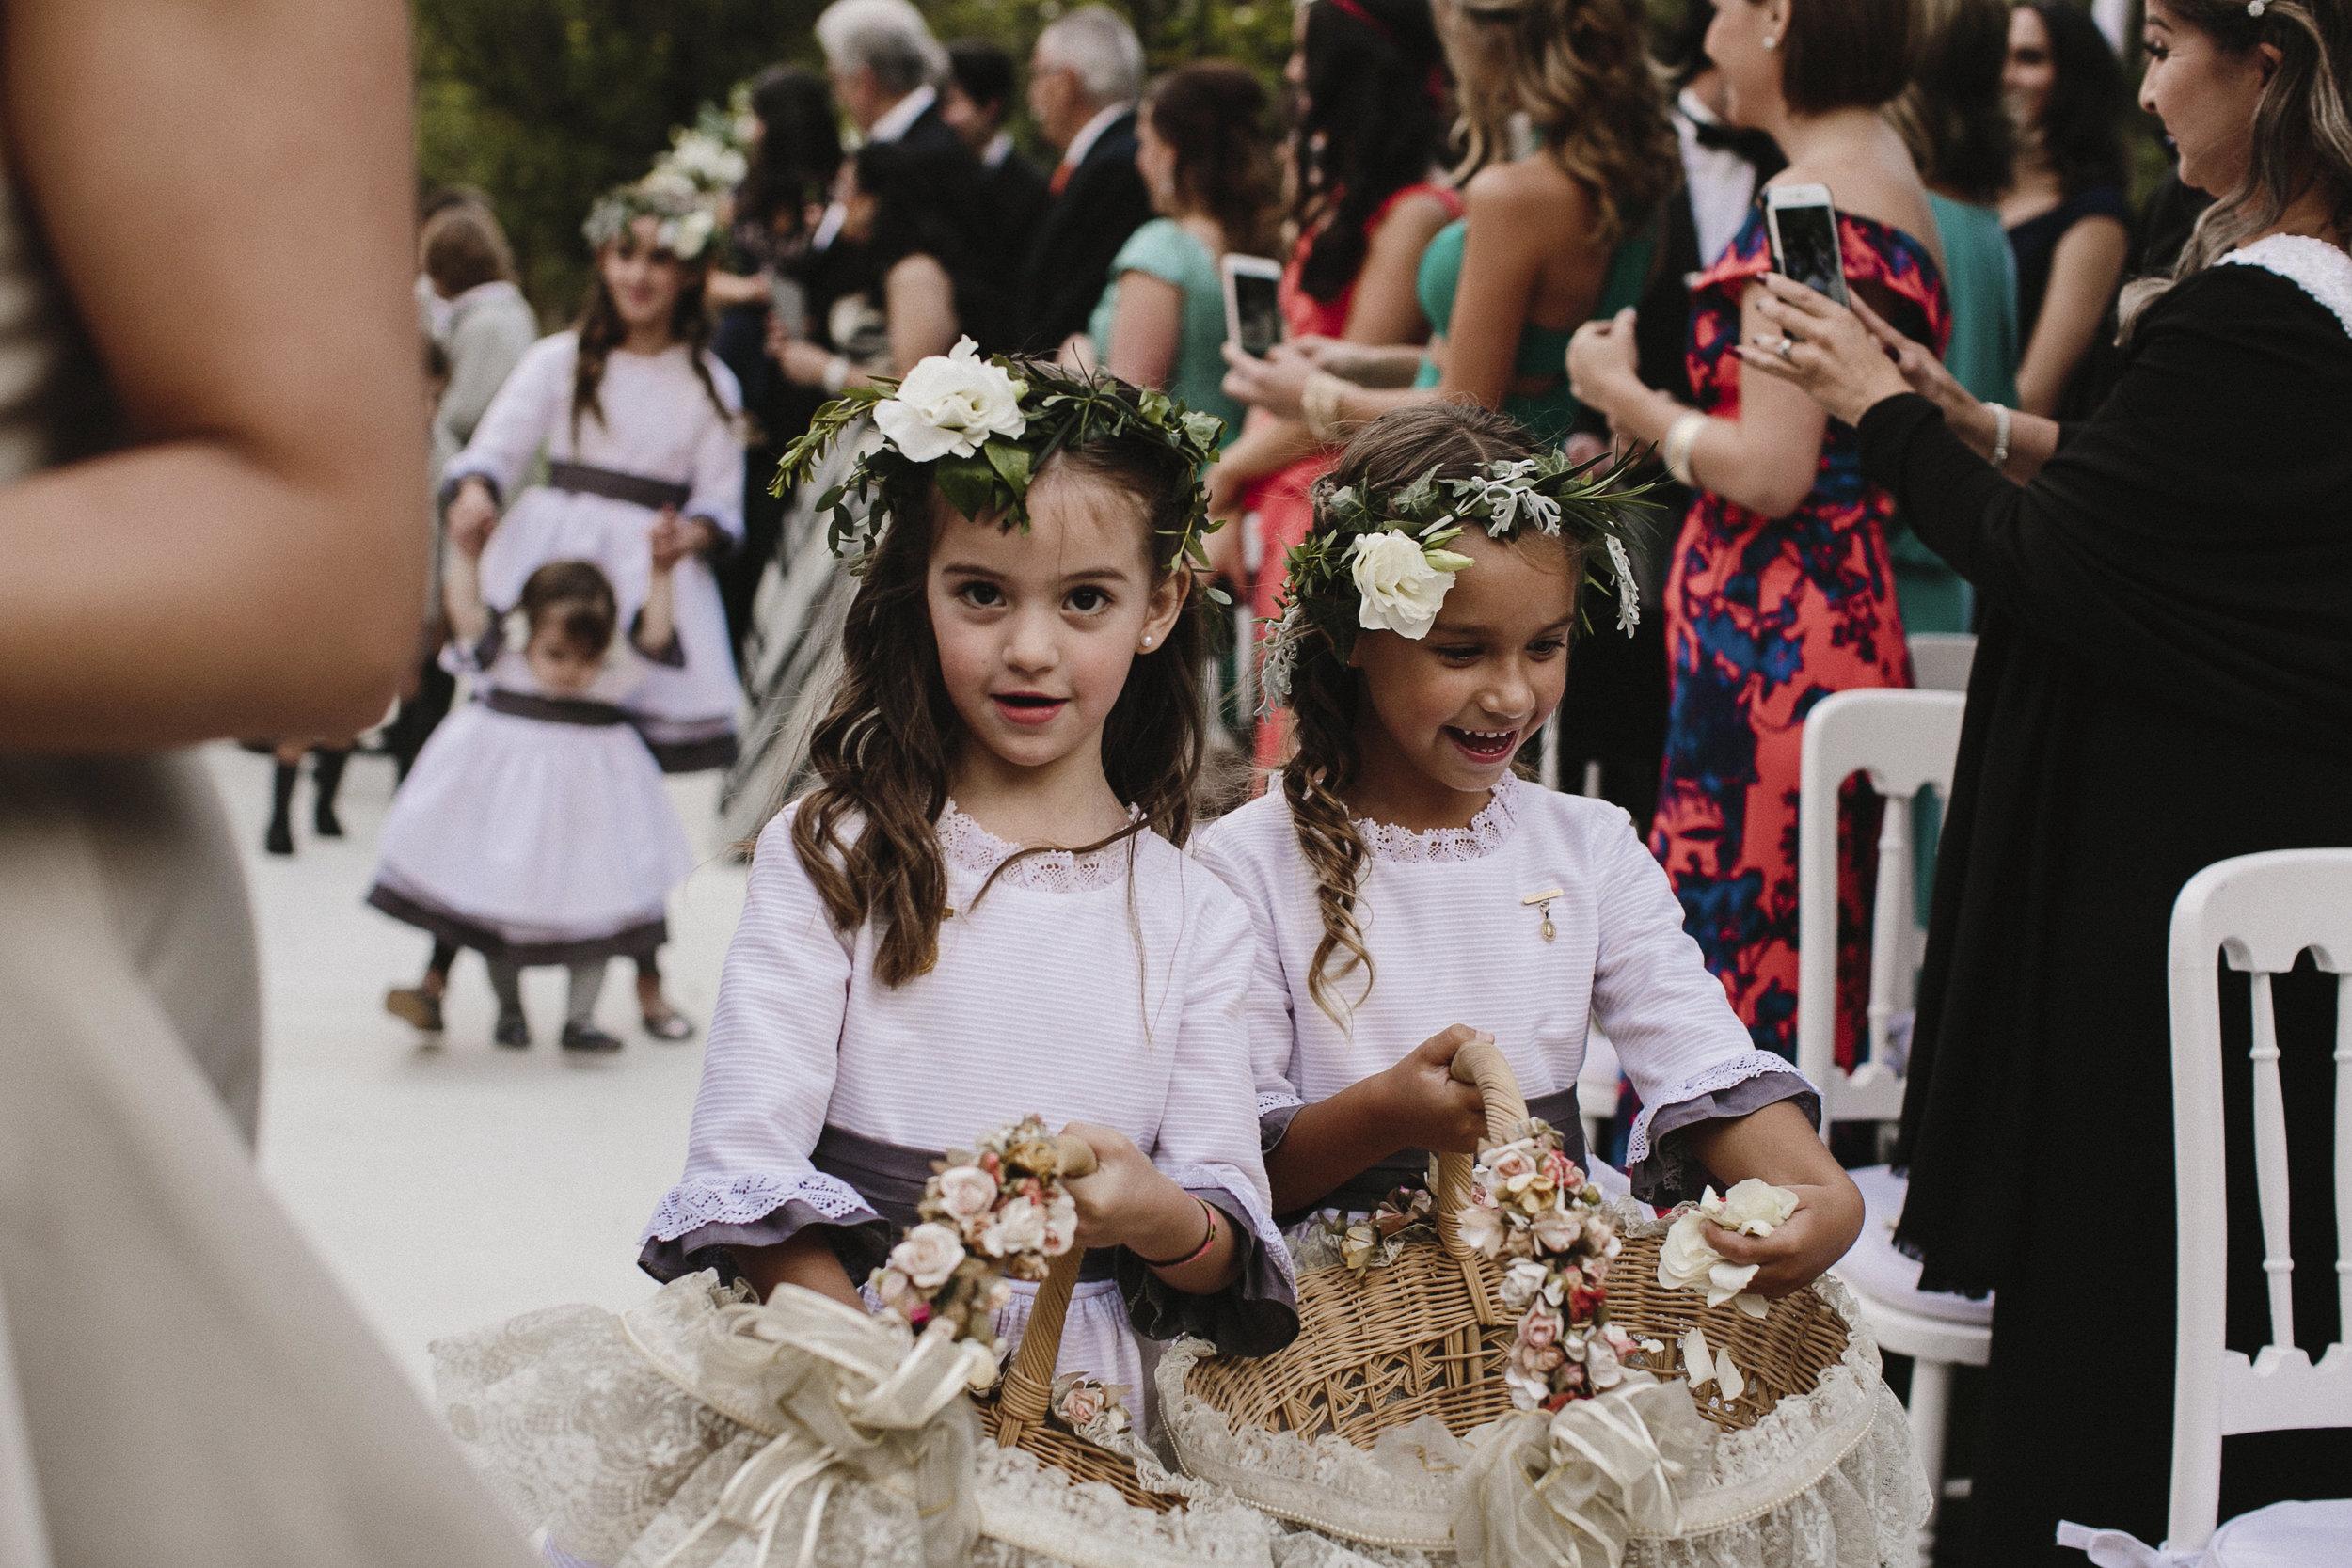 alfonso_flores_destination_wedding_photogrpahy_paola_alonso-378.JPG